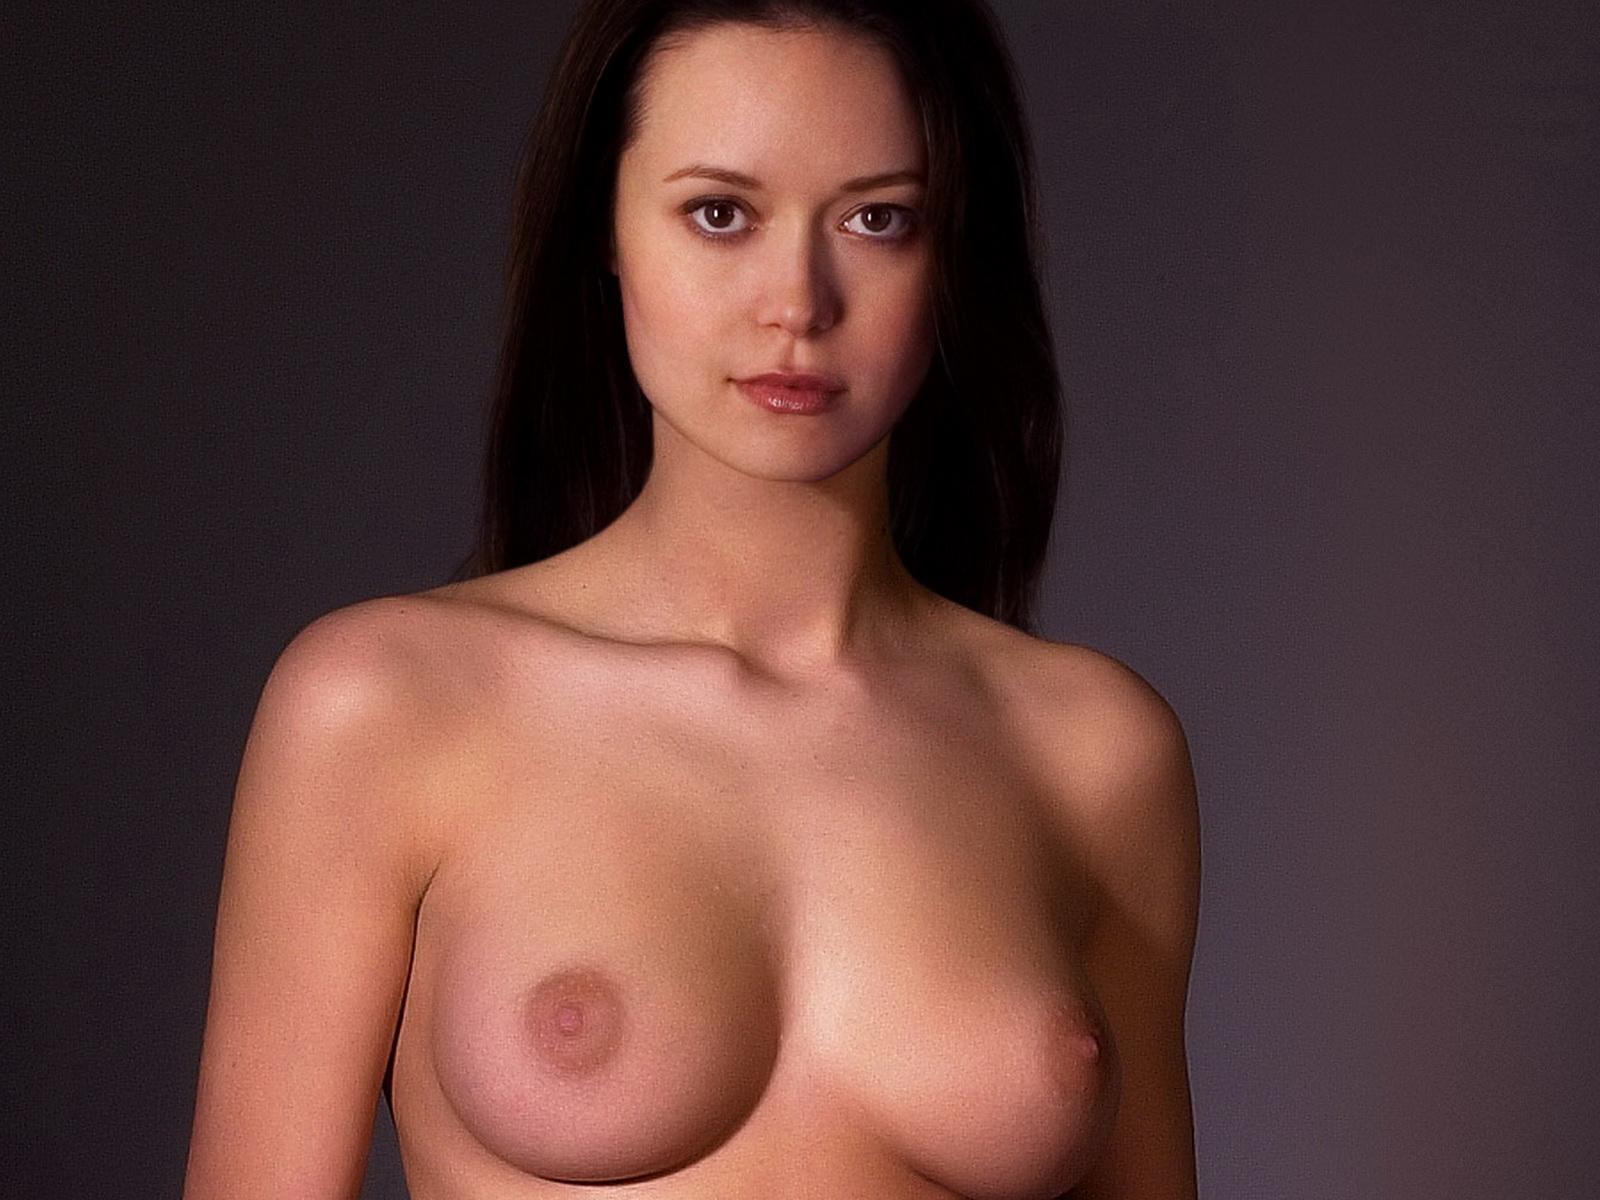 Robin tunney nude wallpaper